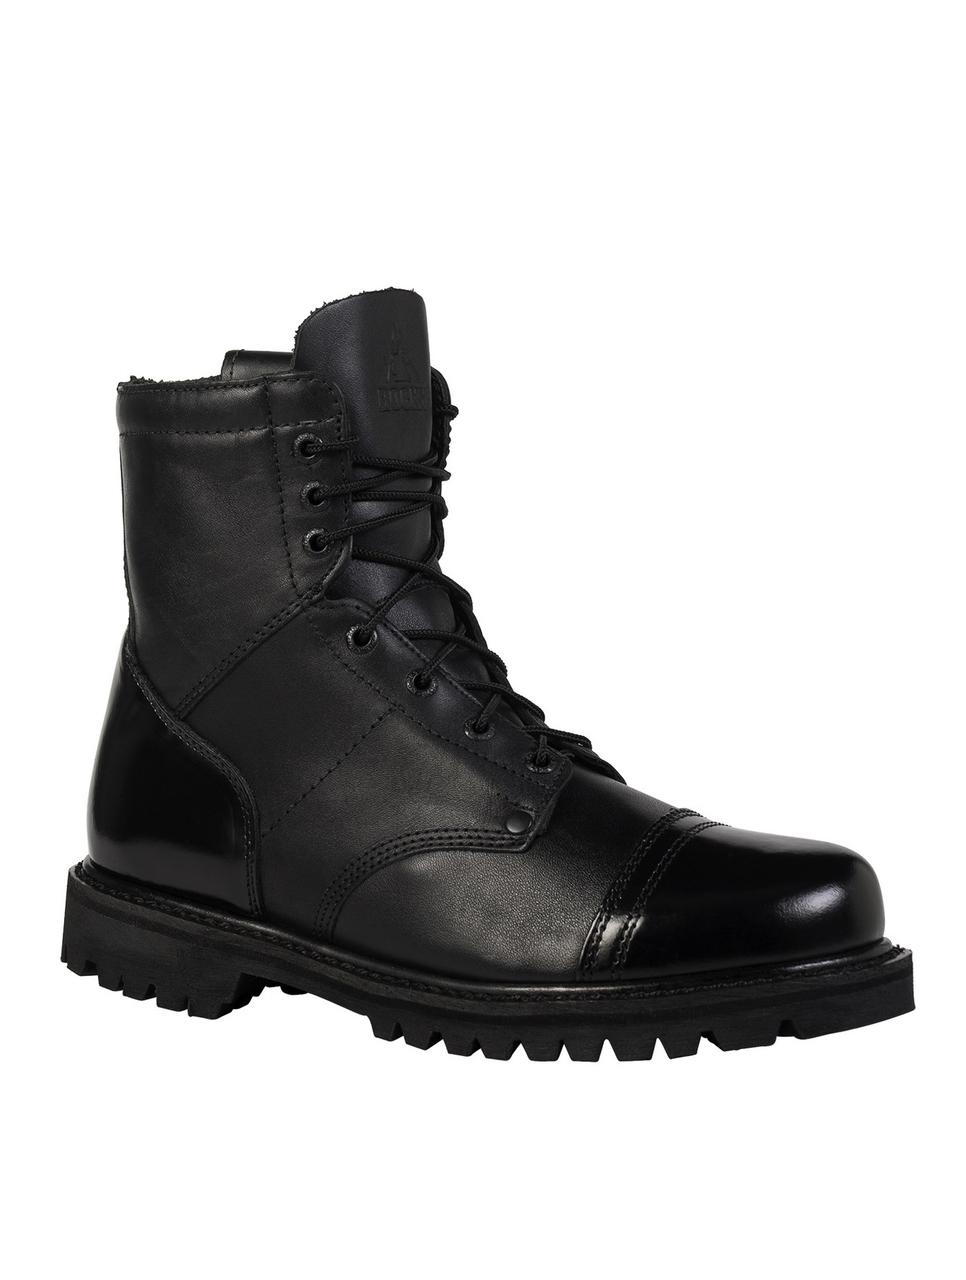 Rocky 7″ Size-Zip Jump Boots